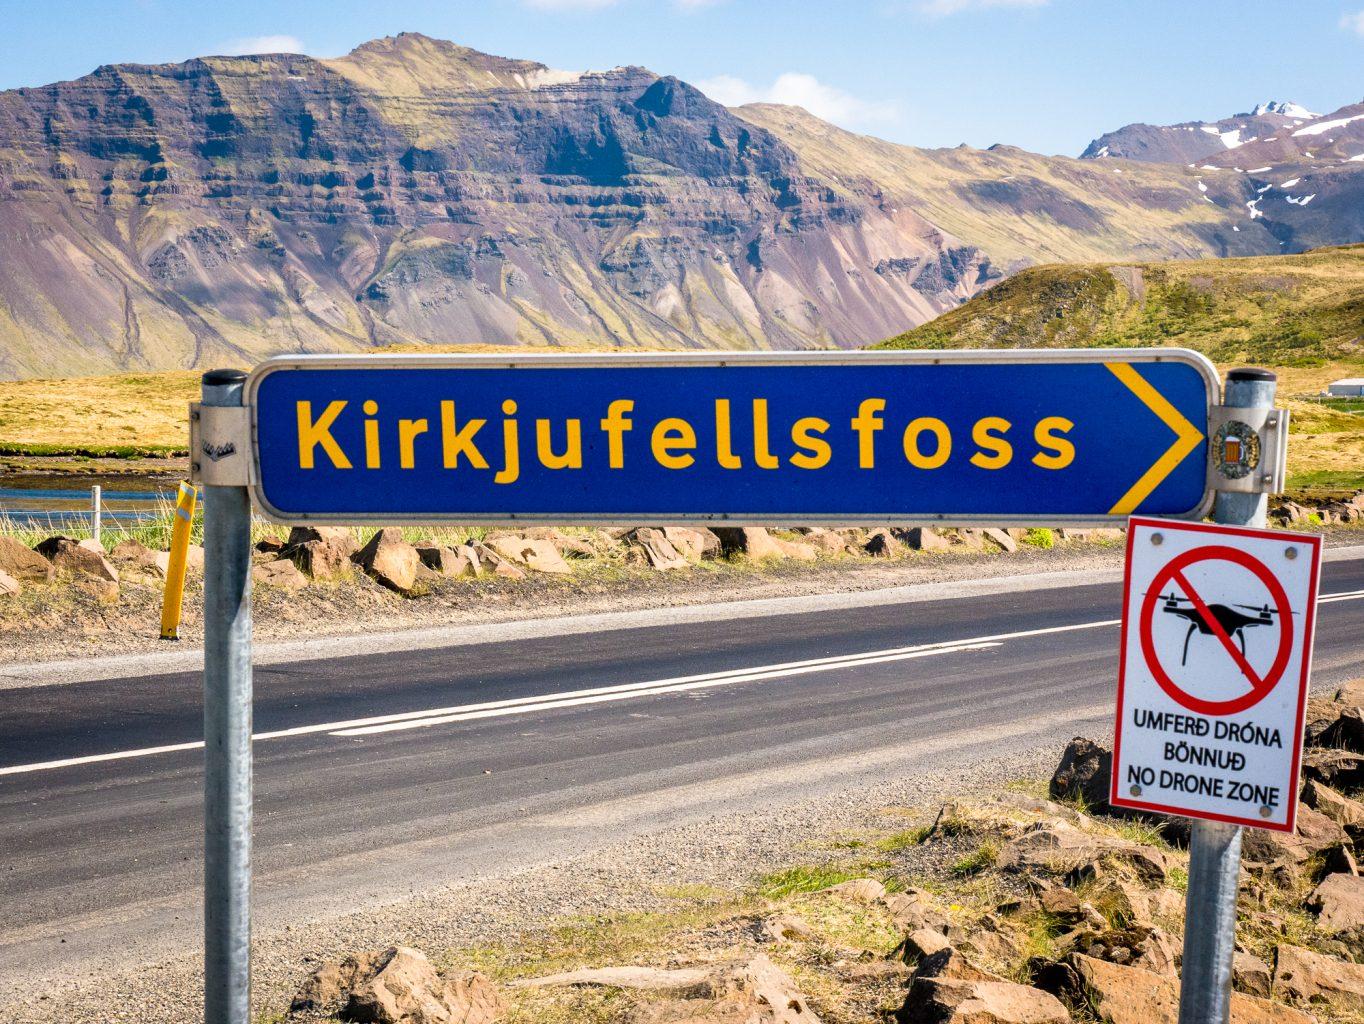 Kirkjufellsfoss sign